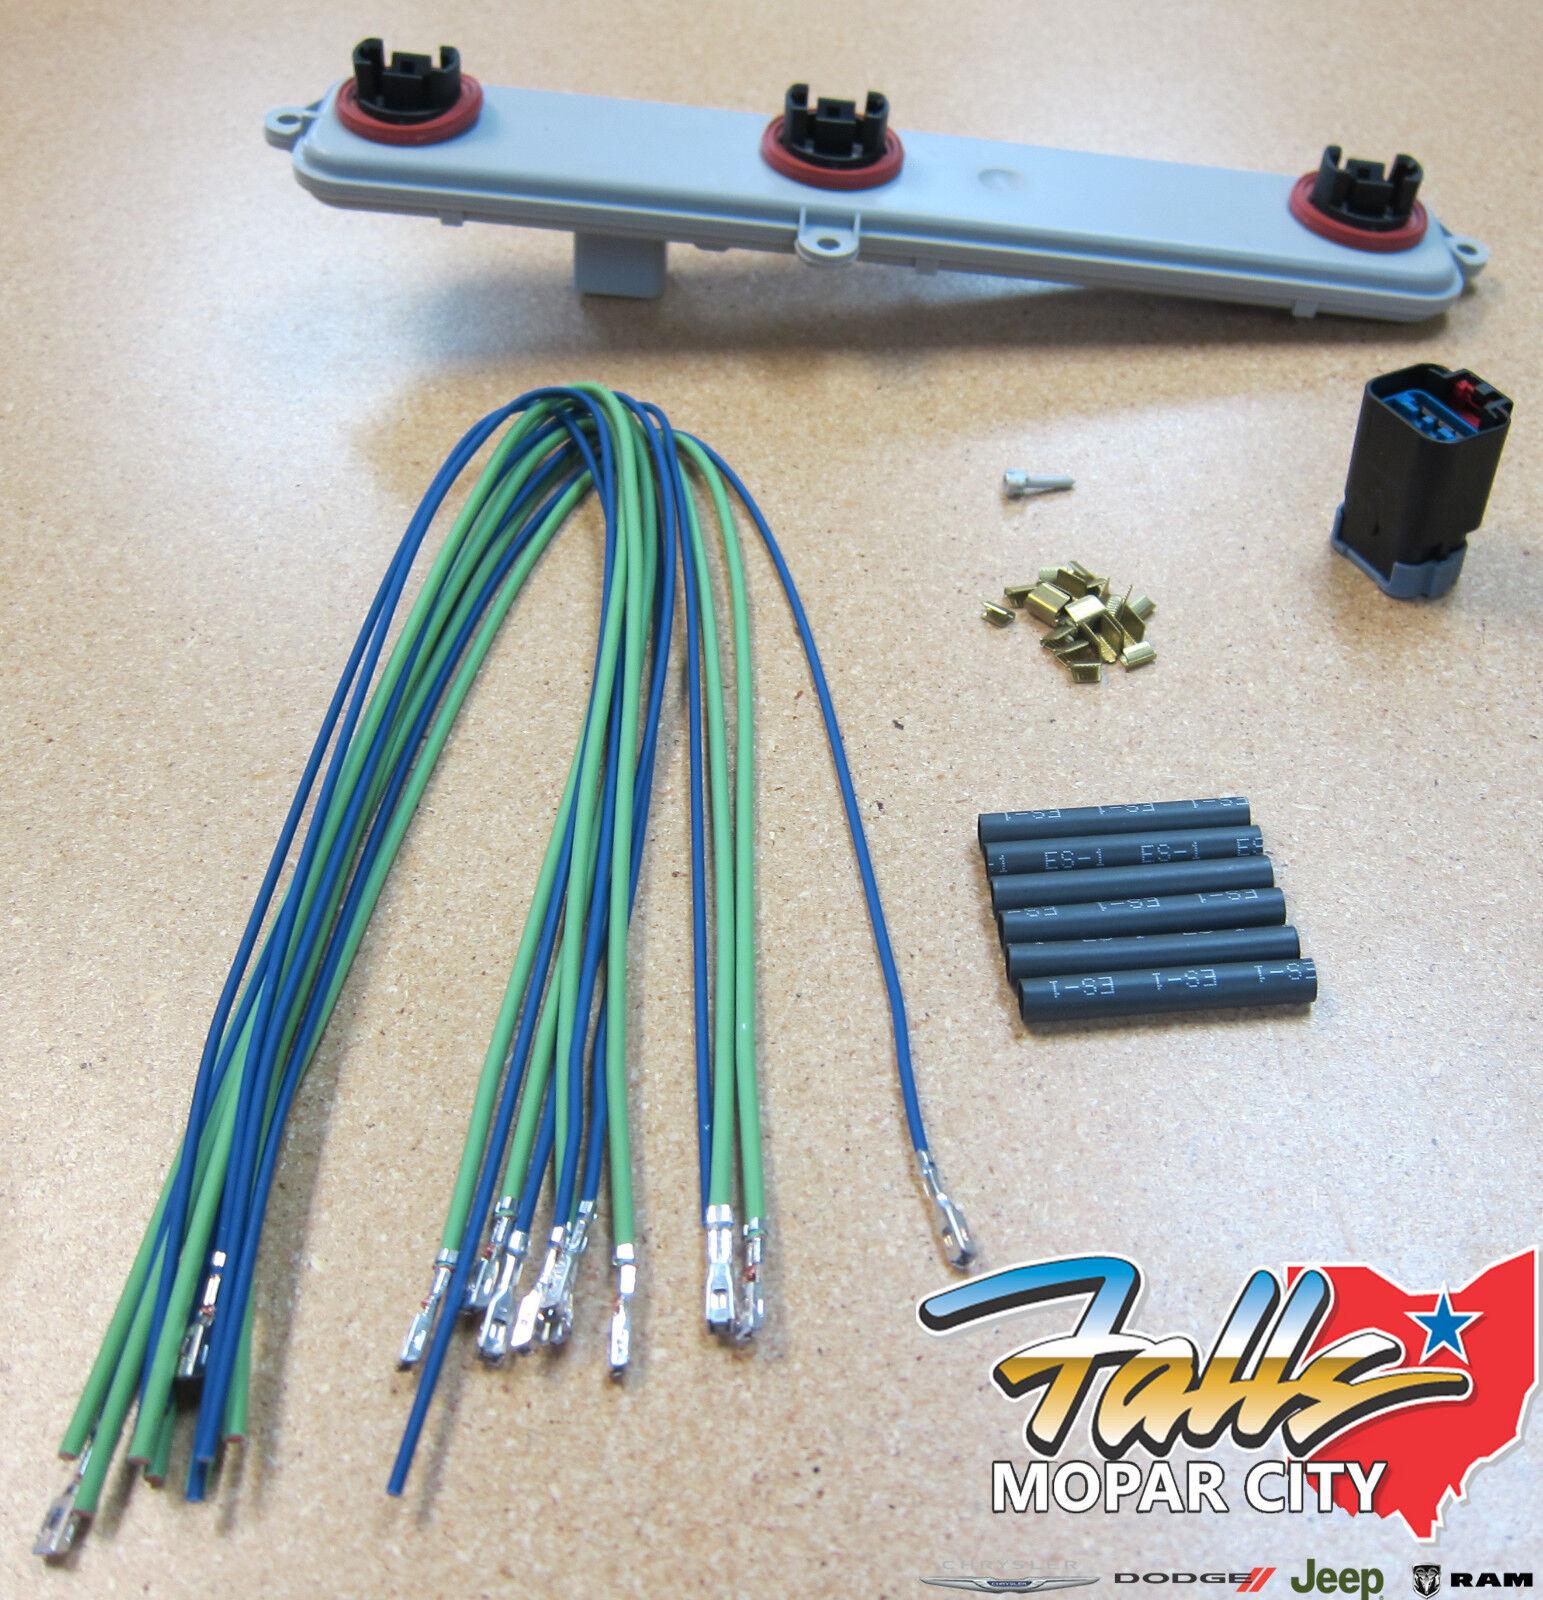 hight resolution of 2002 2006 dodge ram 1500 tail light wiring harness socket 2003 dodge ram tail light